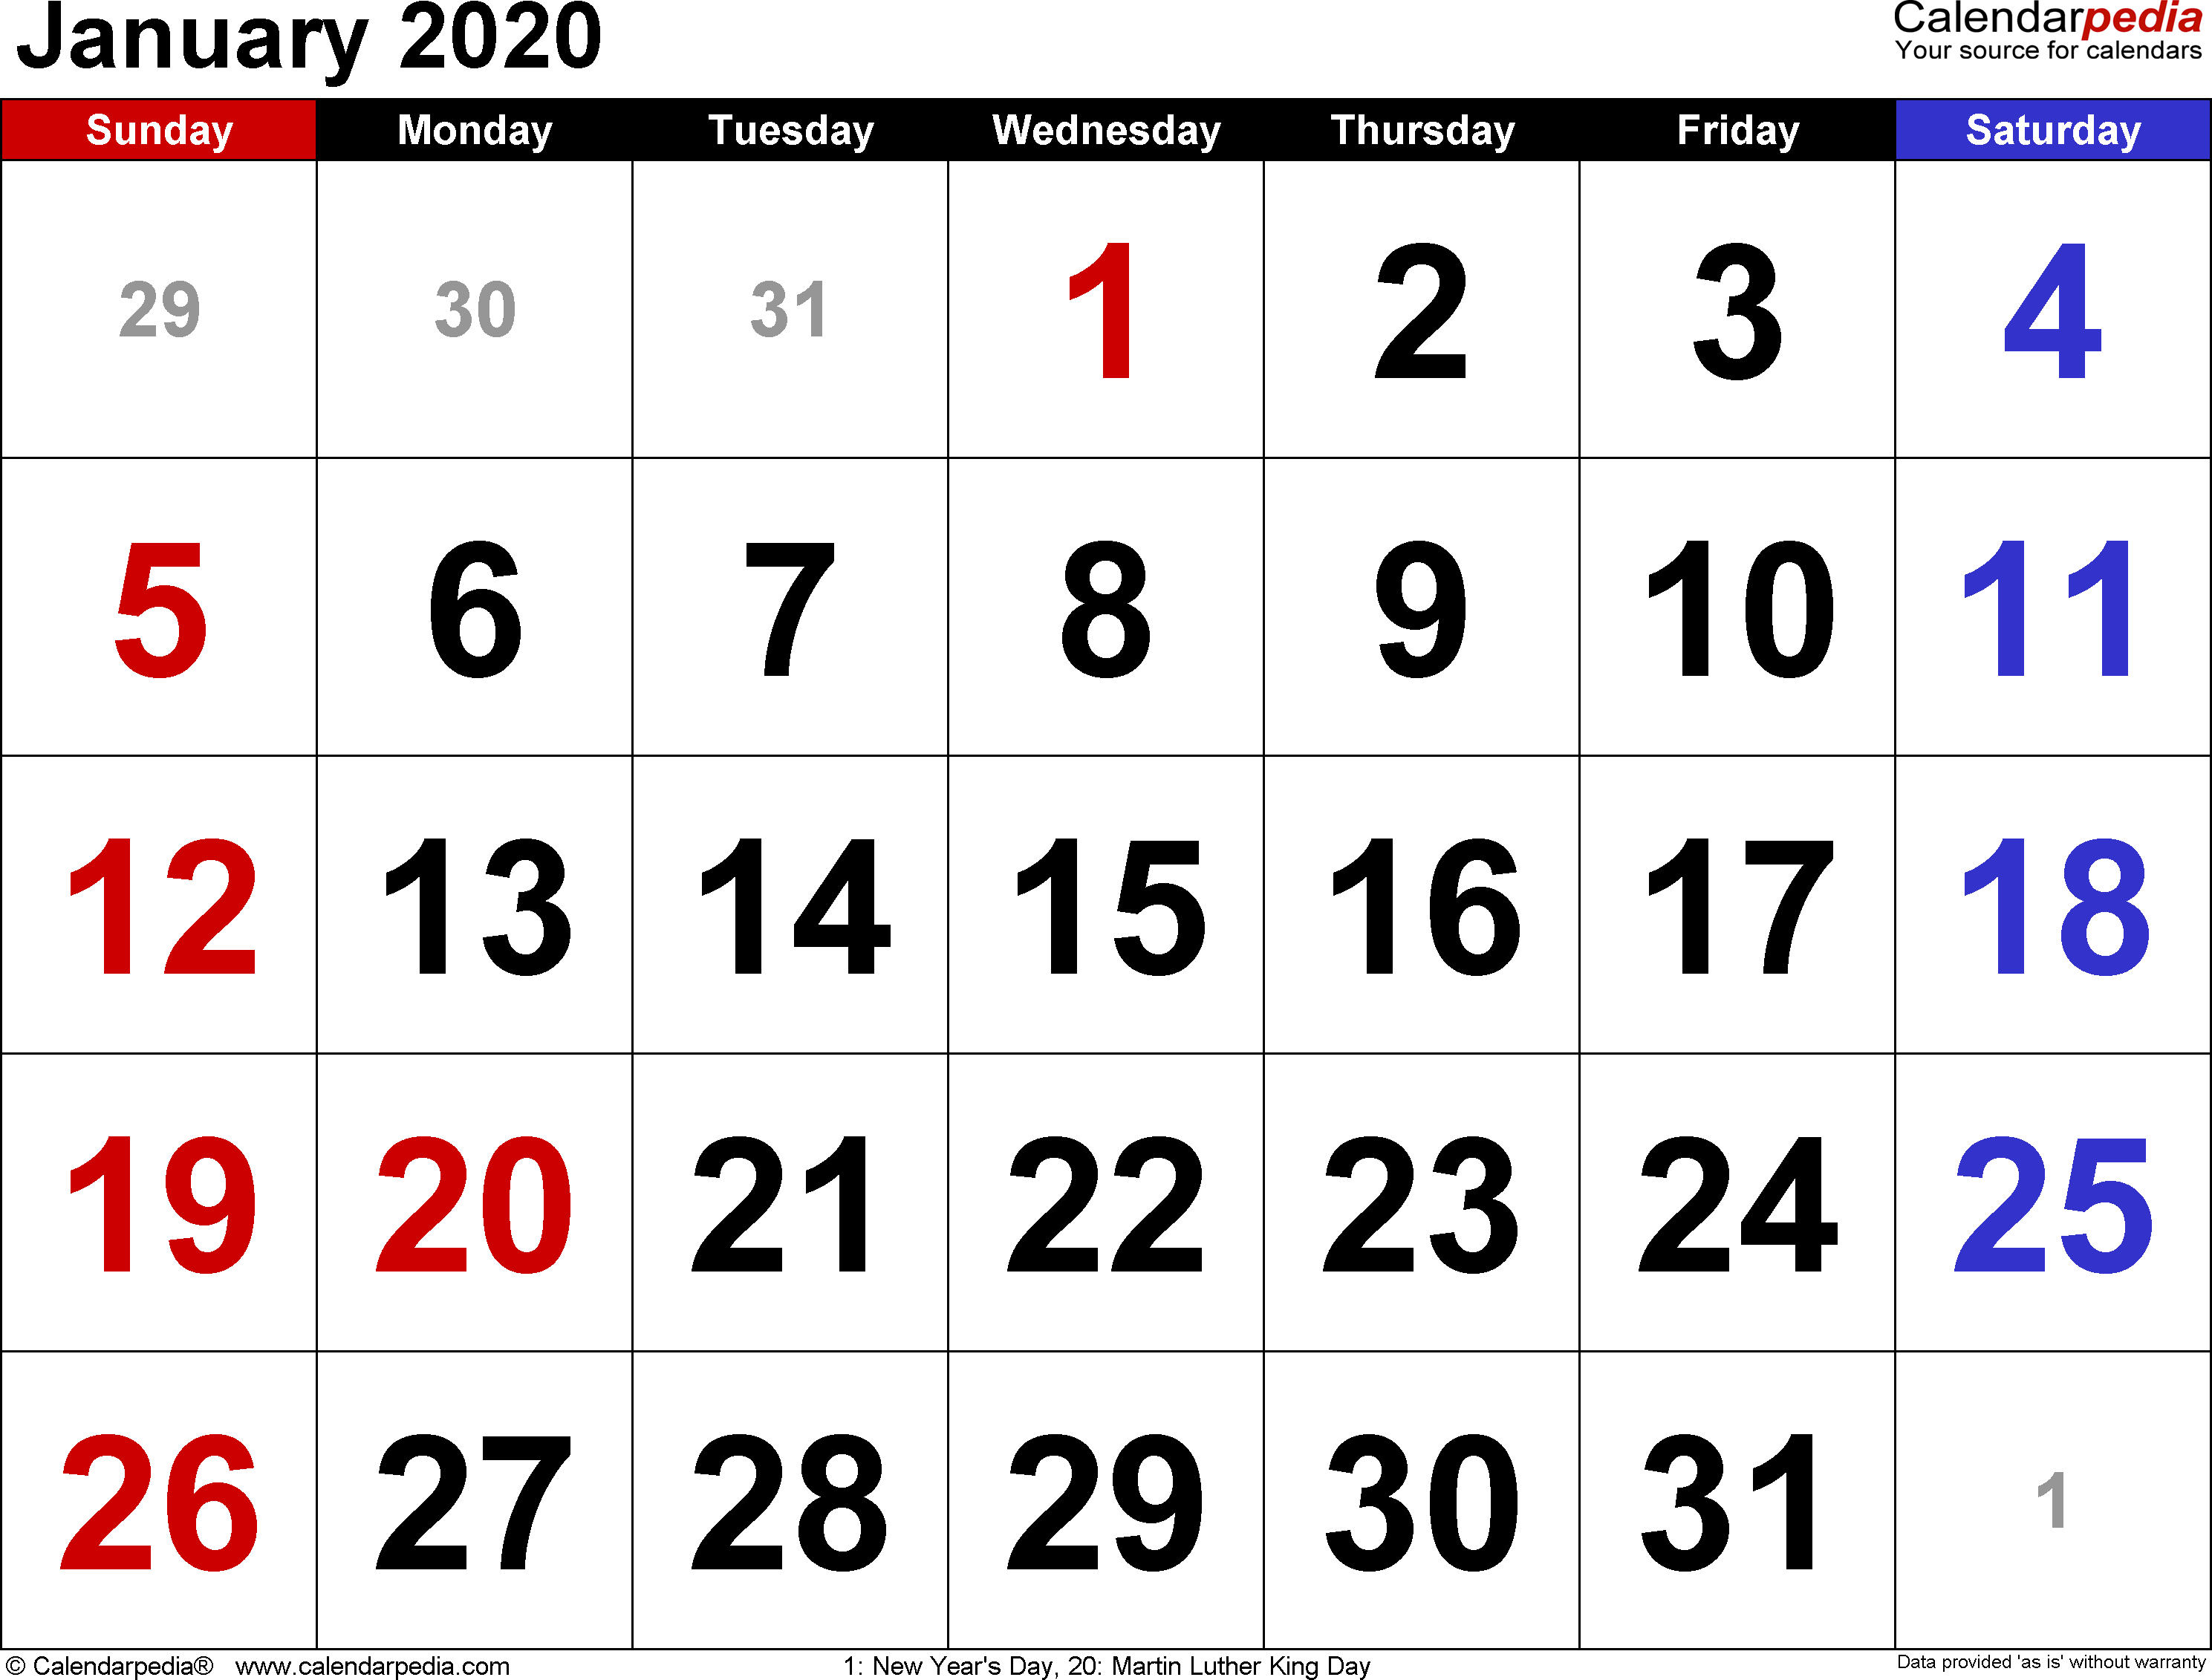 January 2020 Calendar Wallpapers - Top Free January 2020 within January 2020 Calendar